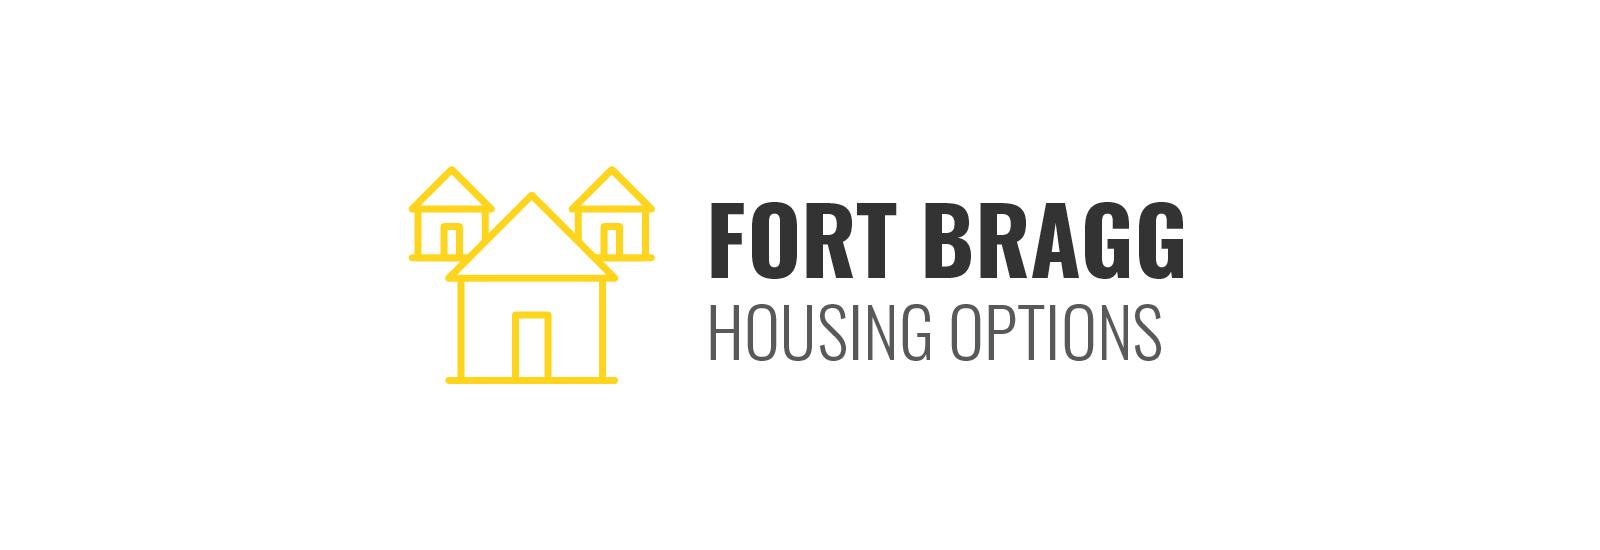 Fort Bragg Housing Options